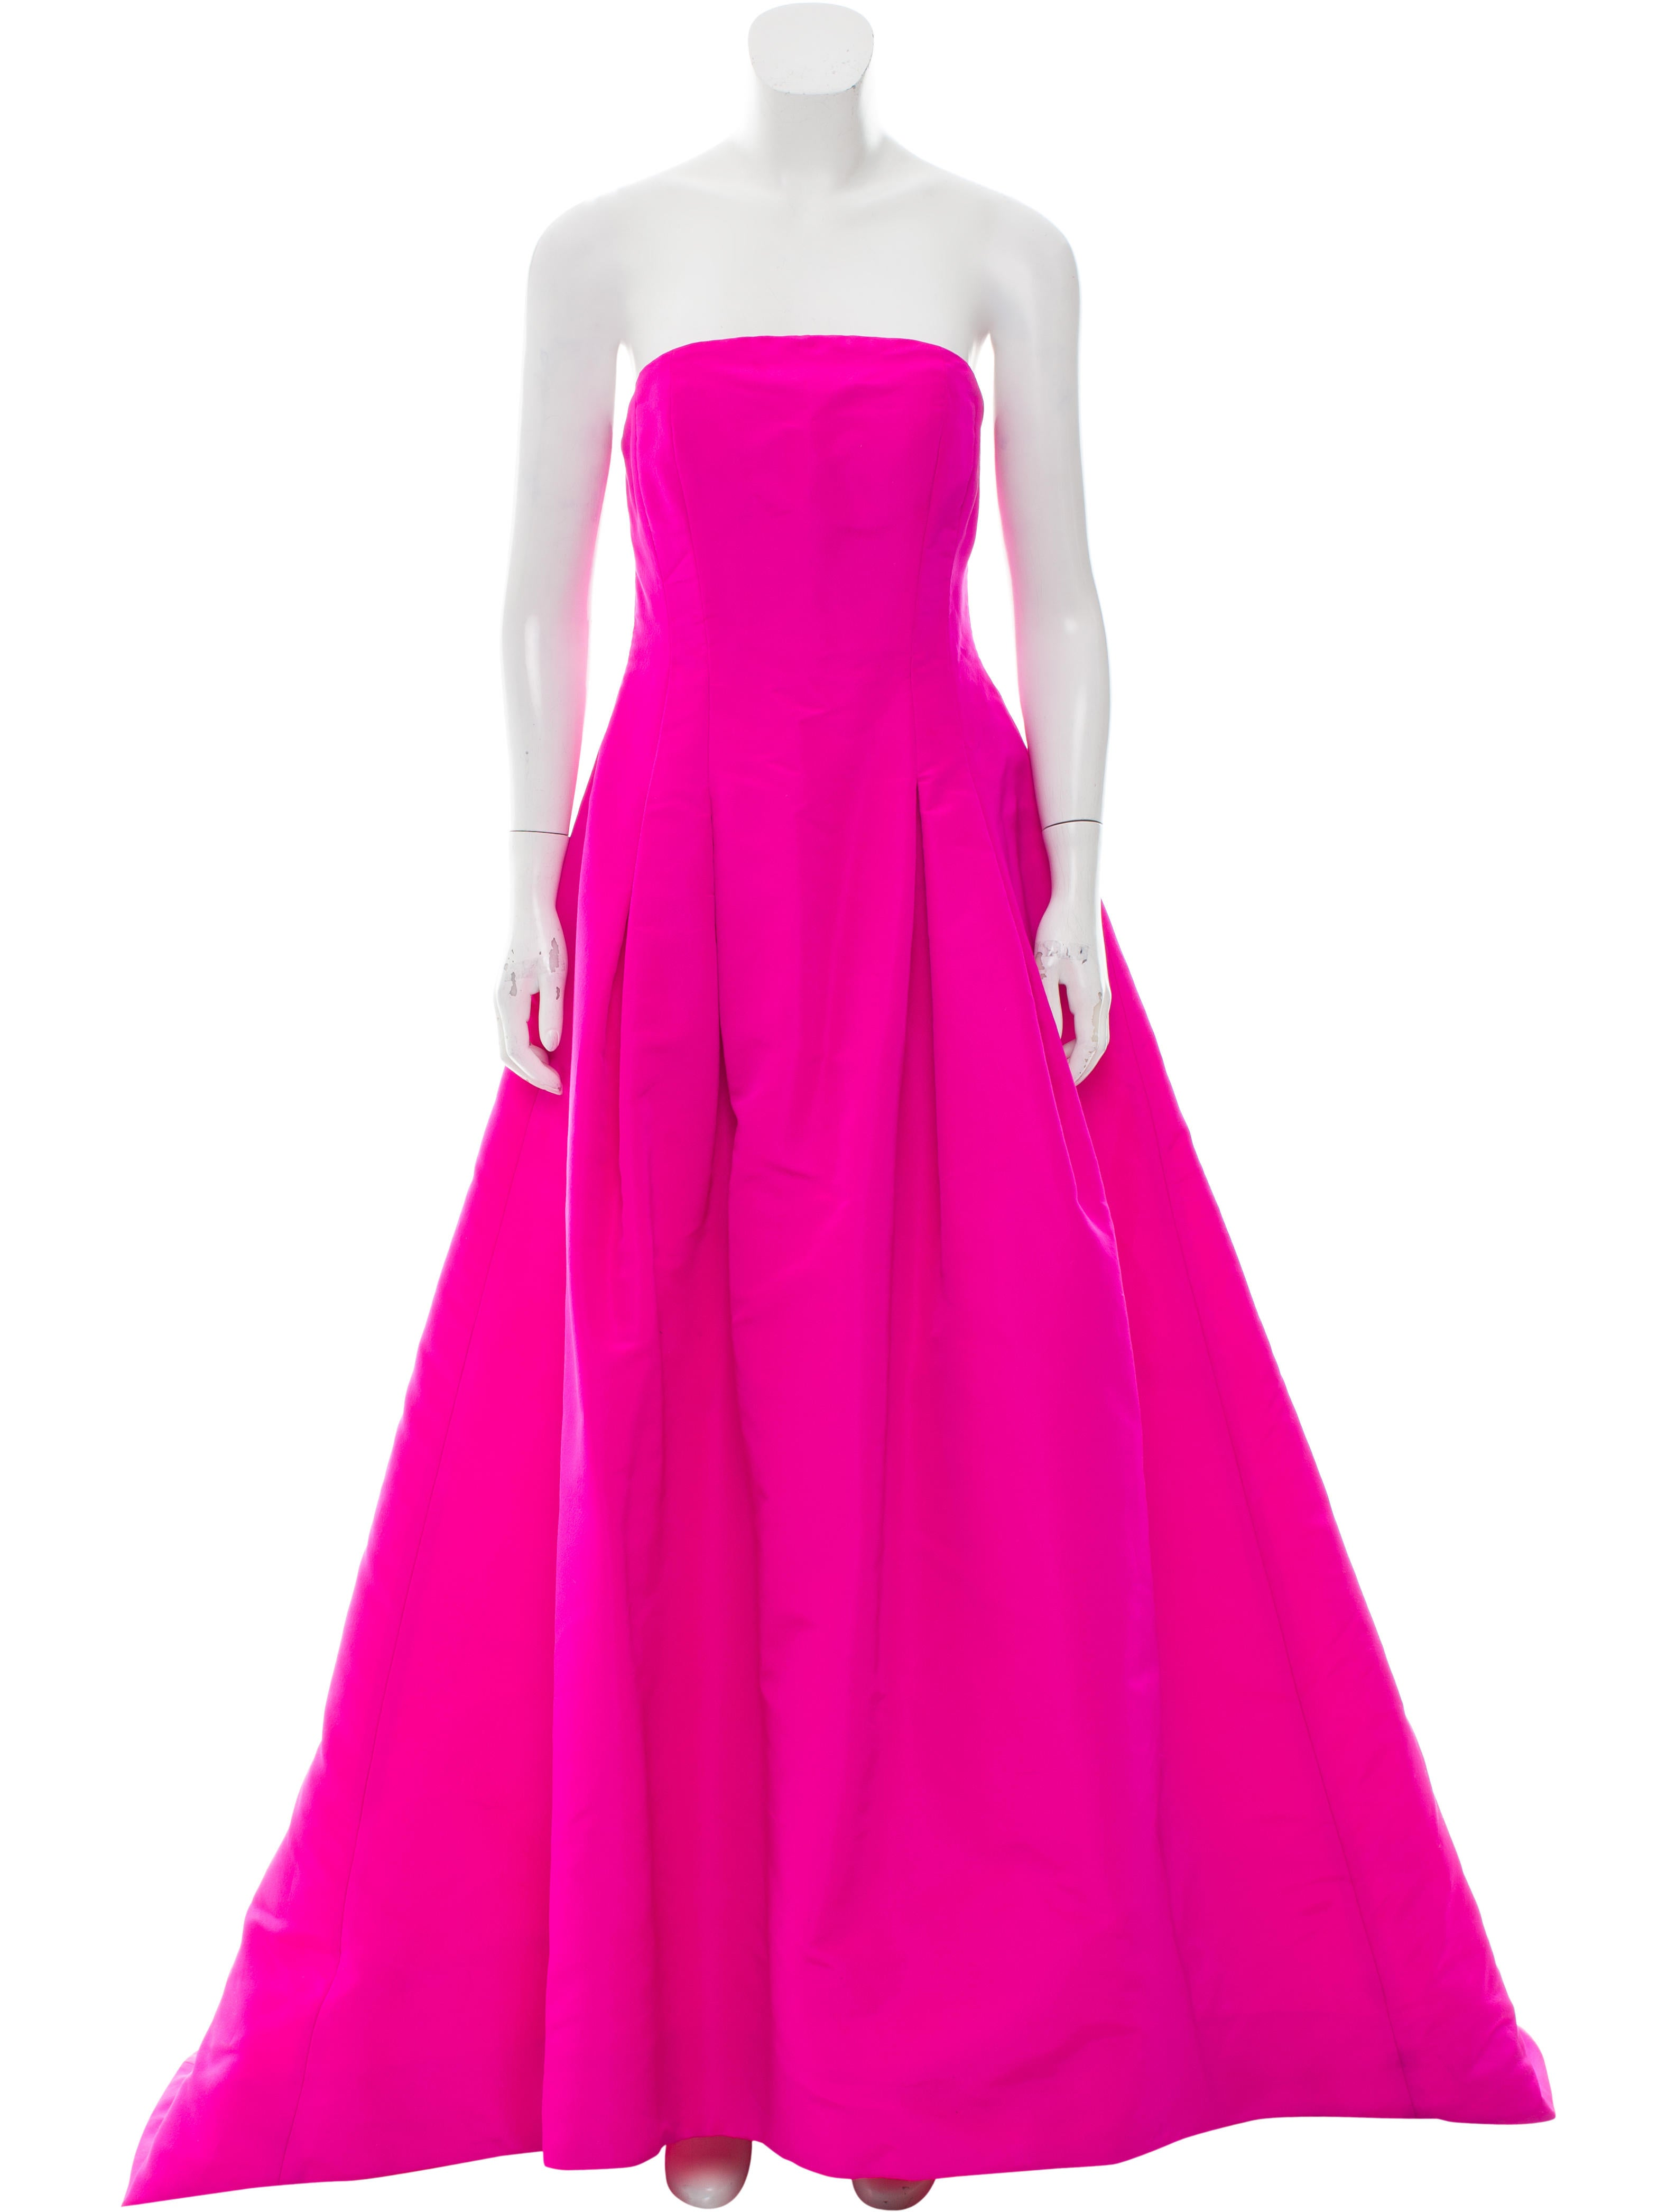 Oscar de la renta pre fall 2015 silk strapless gown for Oscar de la renta candles